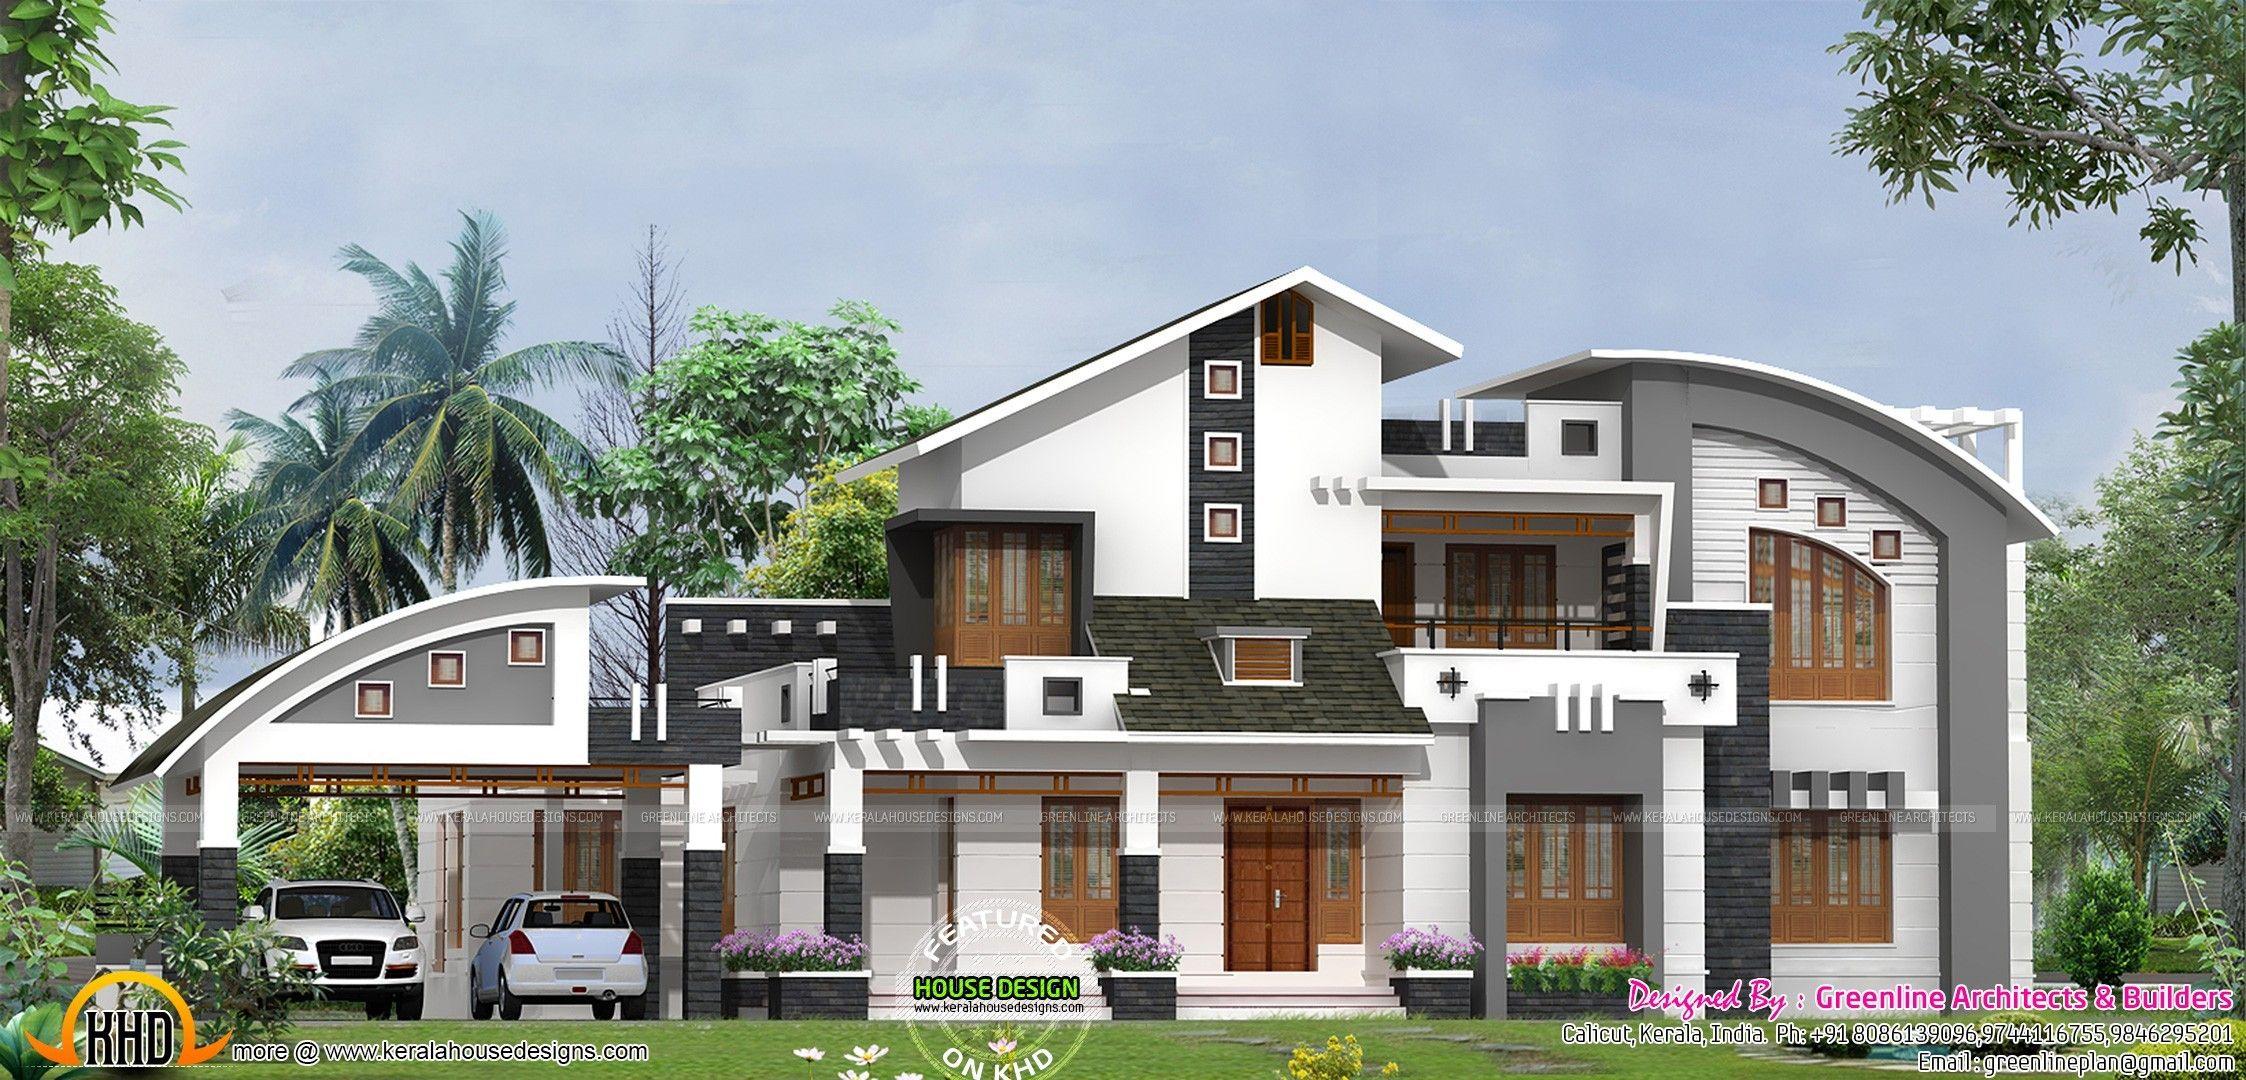 Kerala style homes plans free elegant kerala home plans